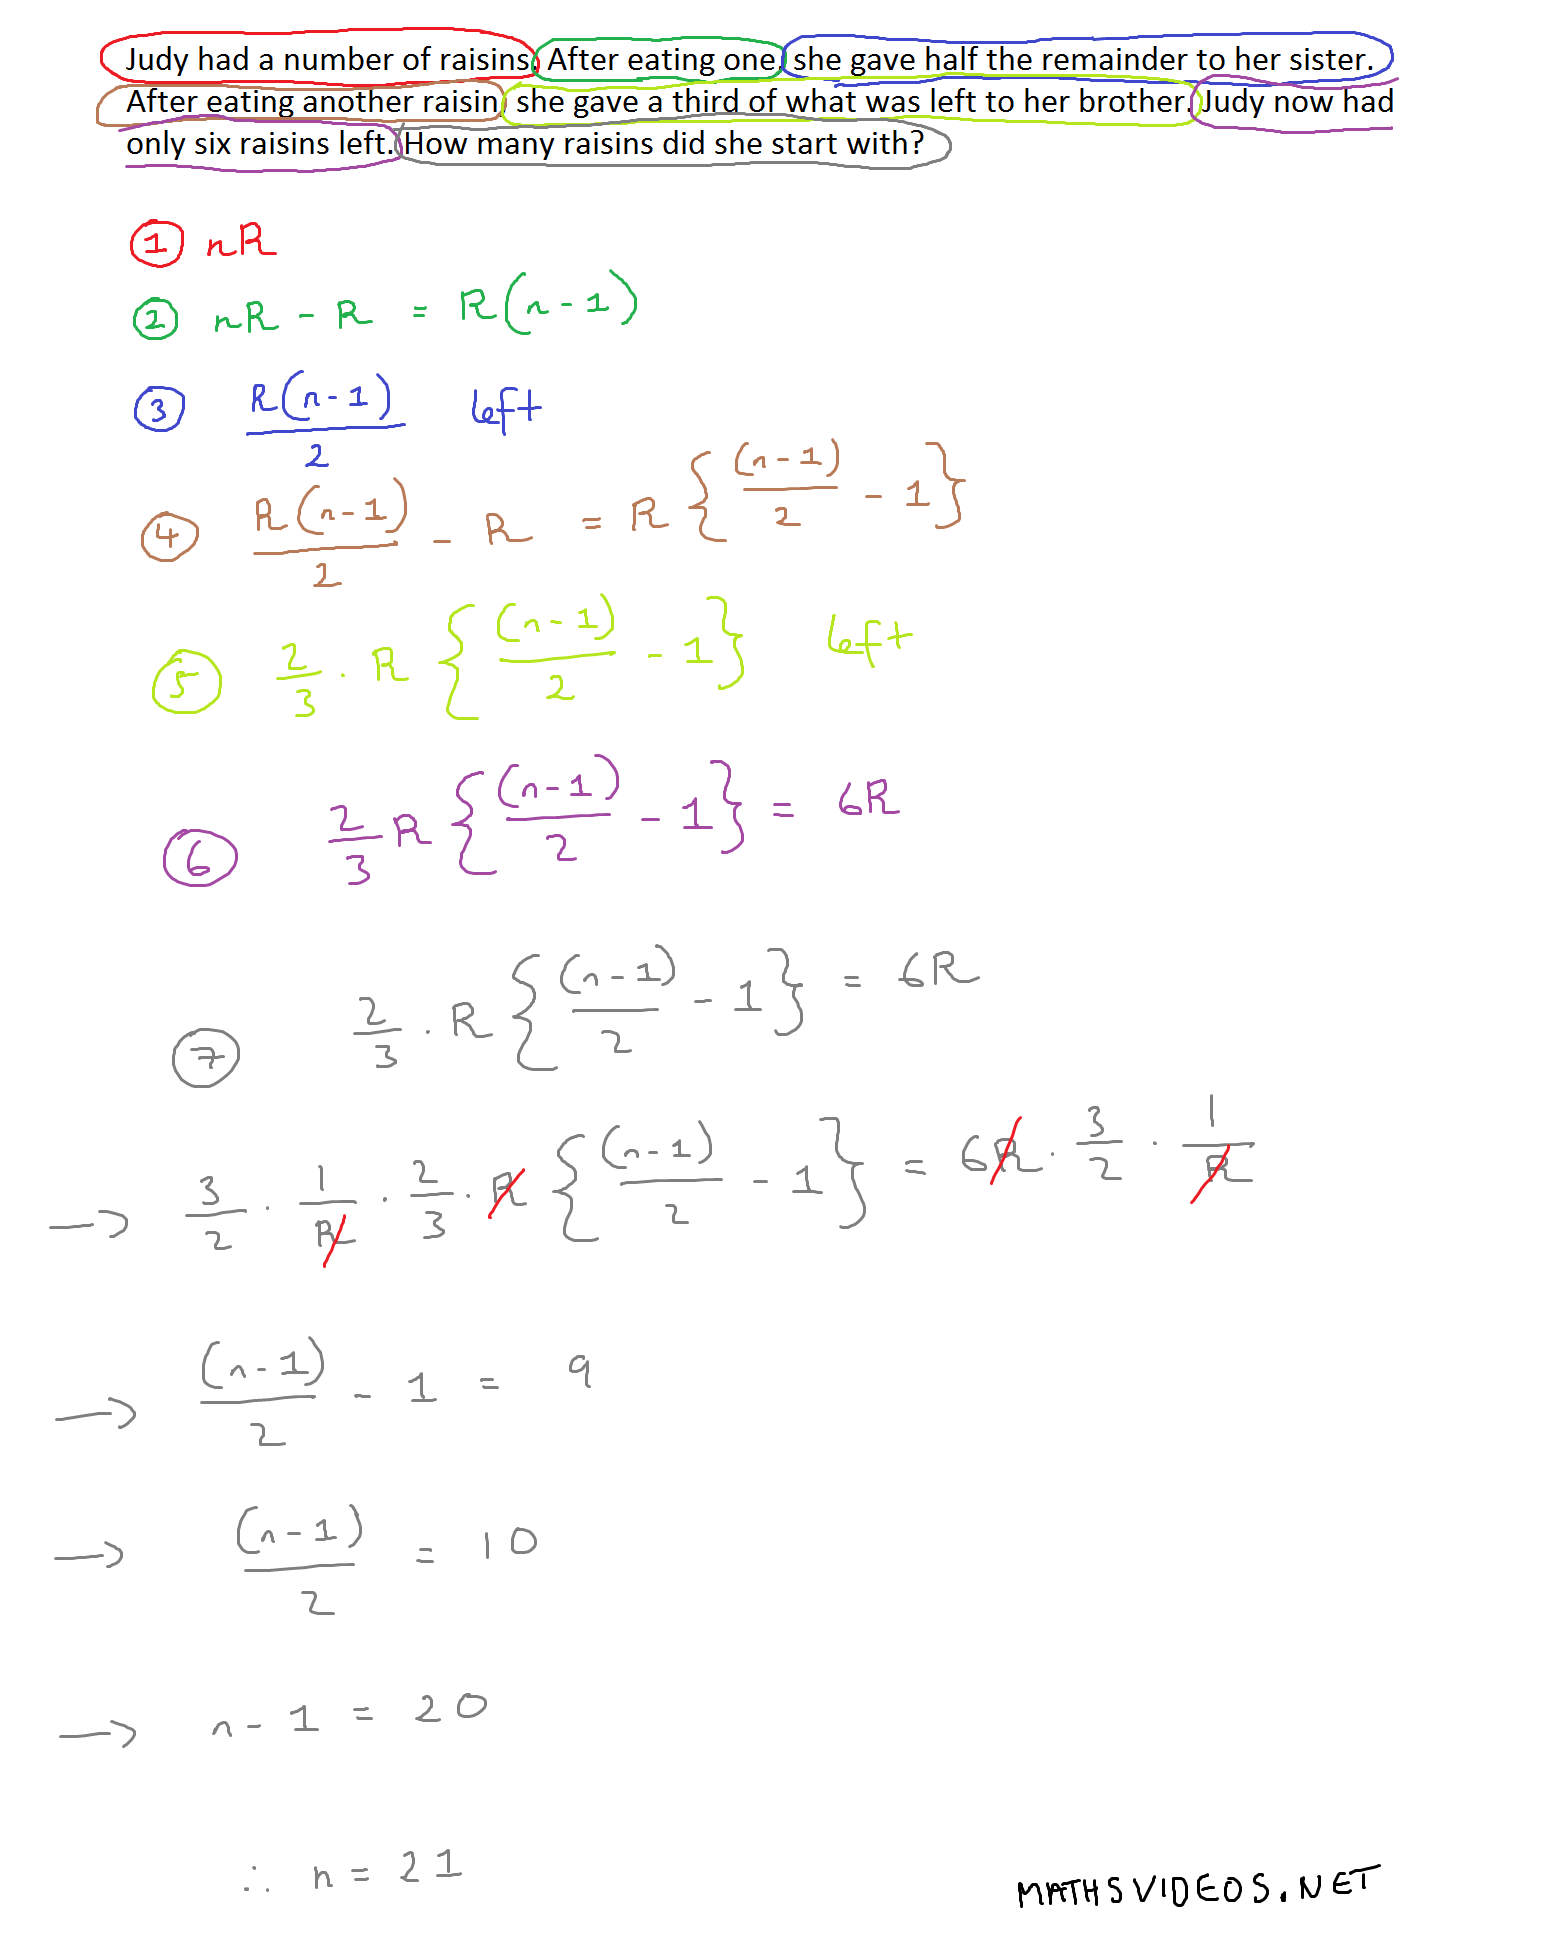 Judy Raisins Problem Solved Mathematics Amp Iq